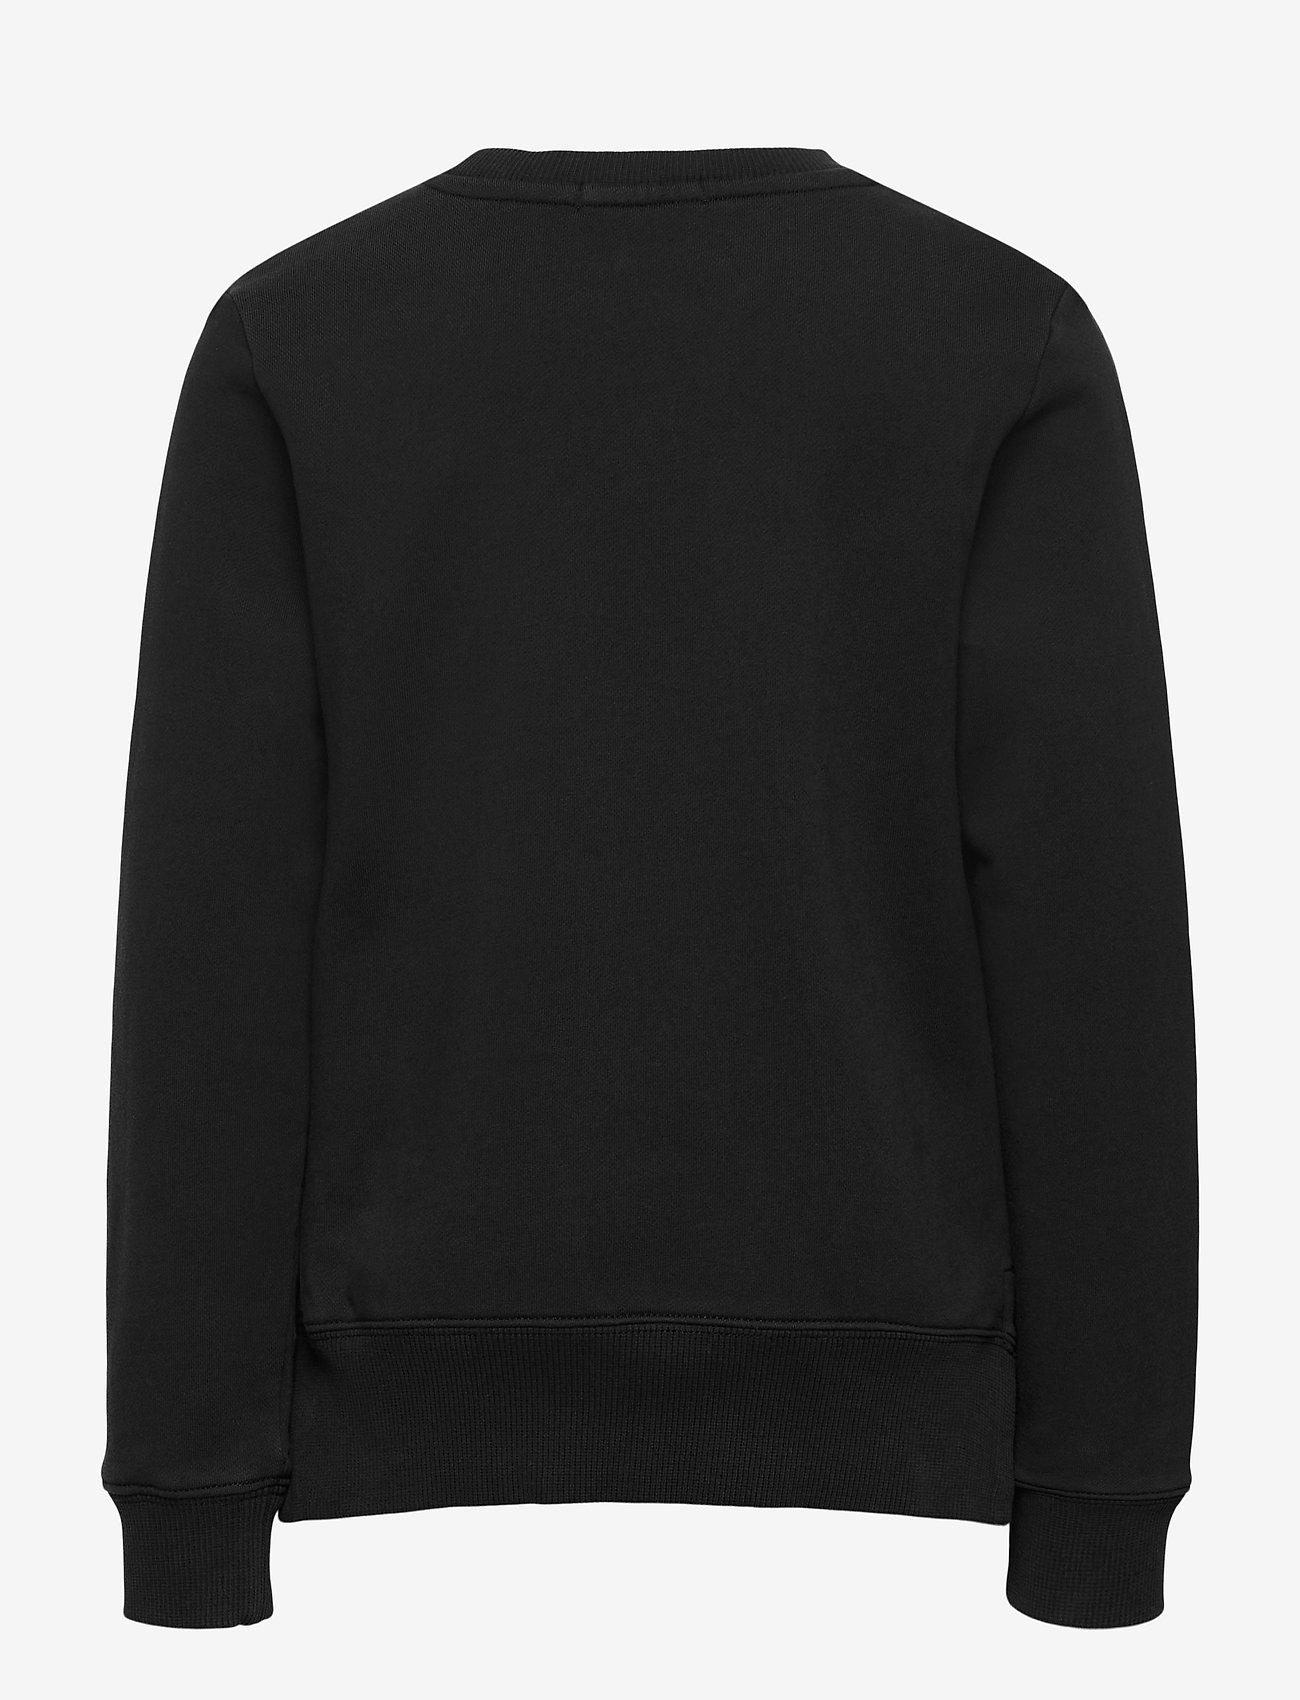 Calvin Klein - RAISED MONOGRAM SWEATSHIRT - sweatshirts - ck black - 1